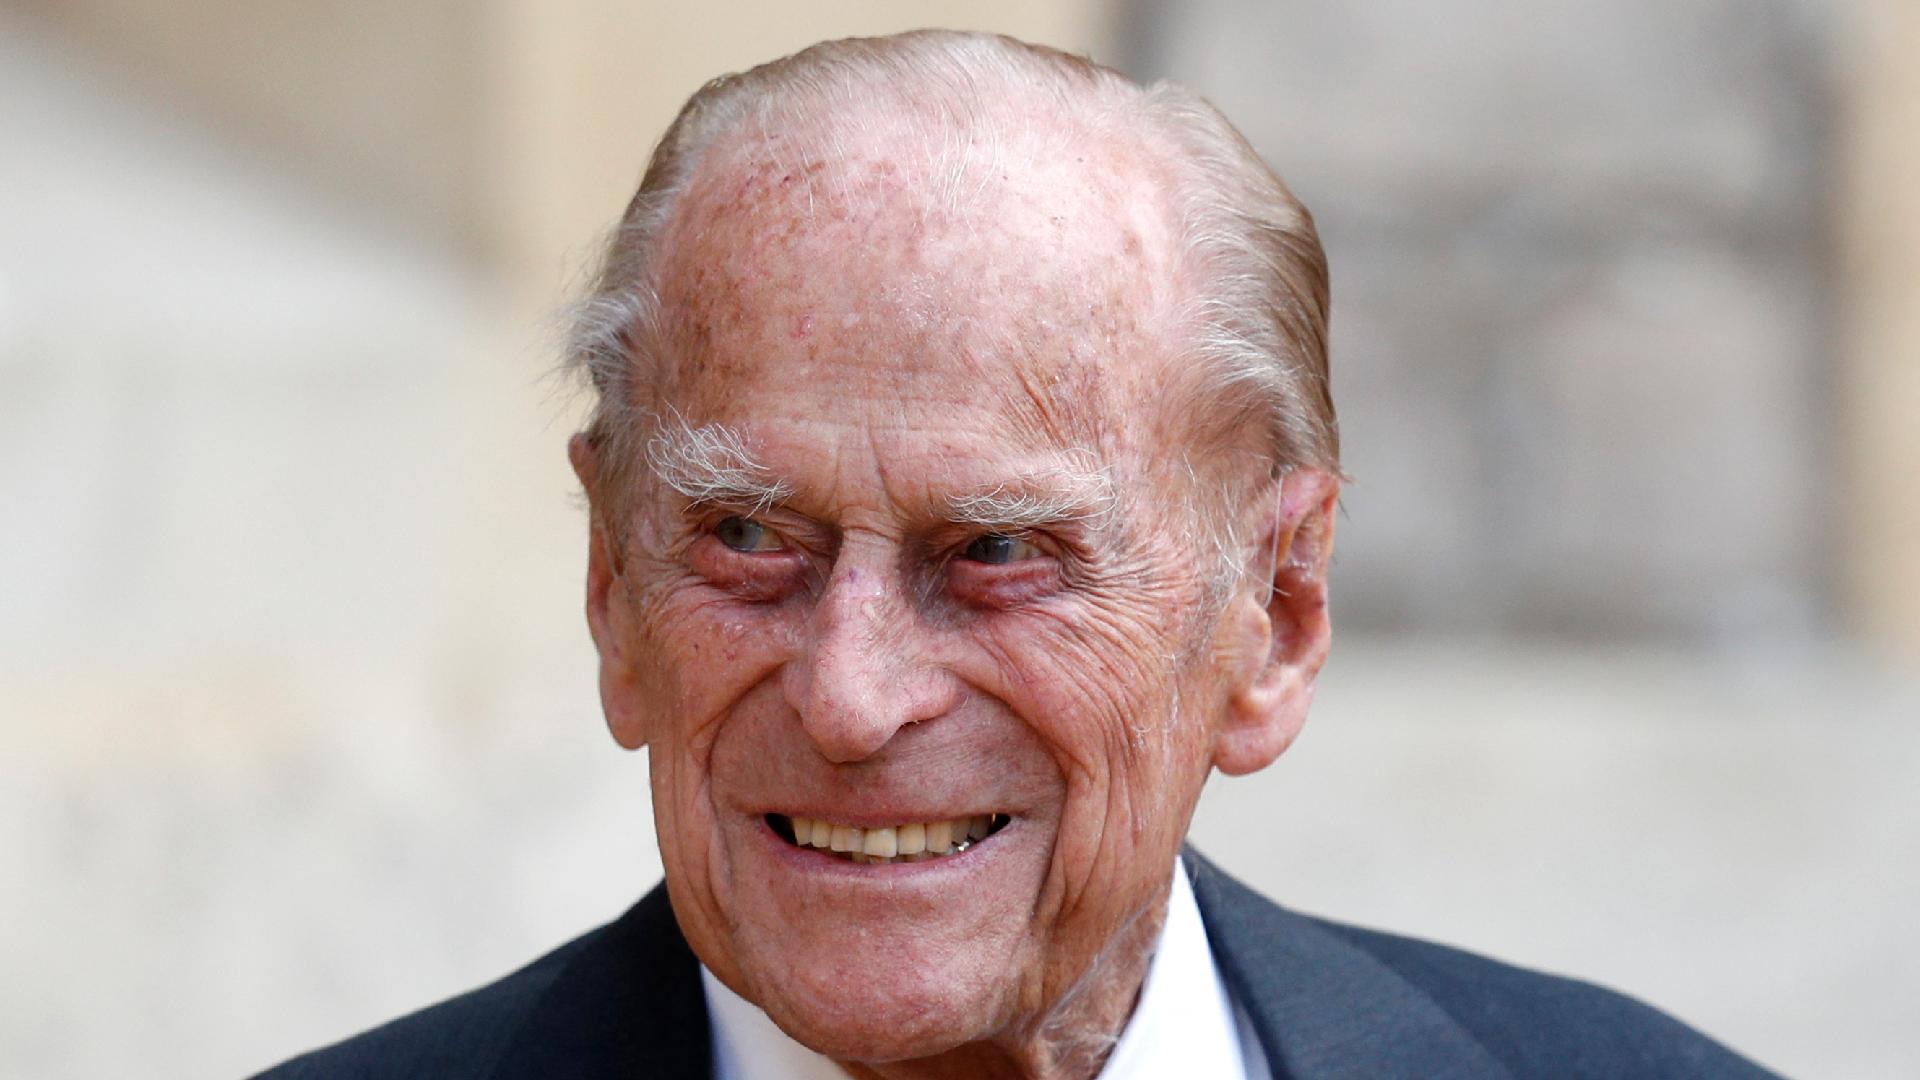 Prince Philip underwent heart surgery